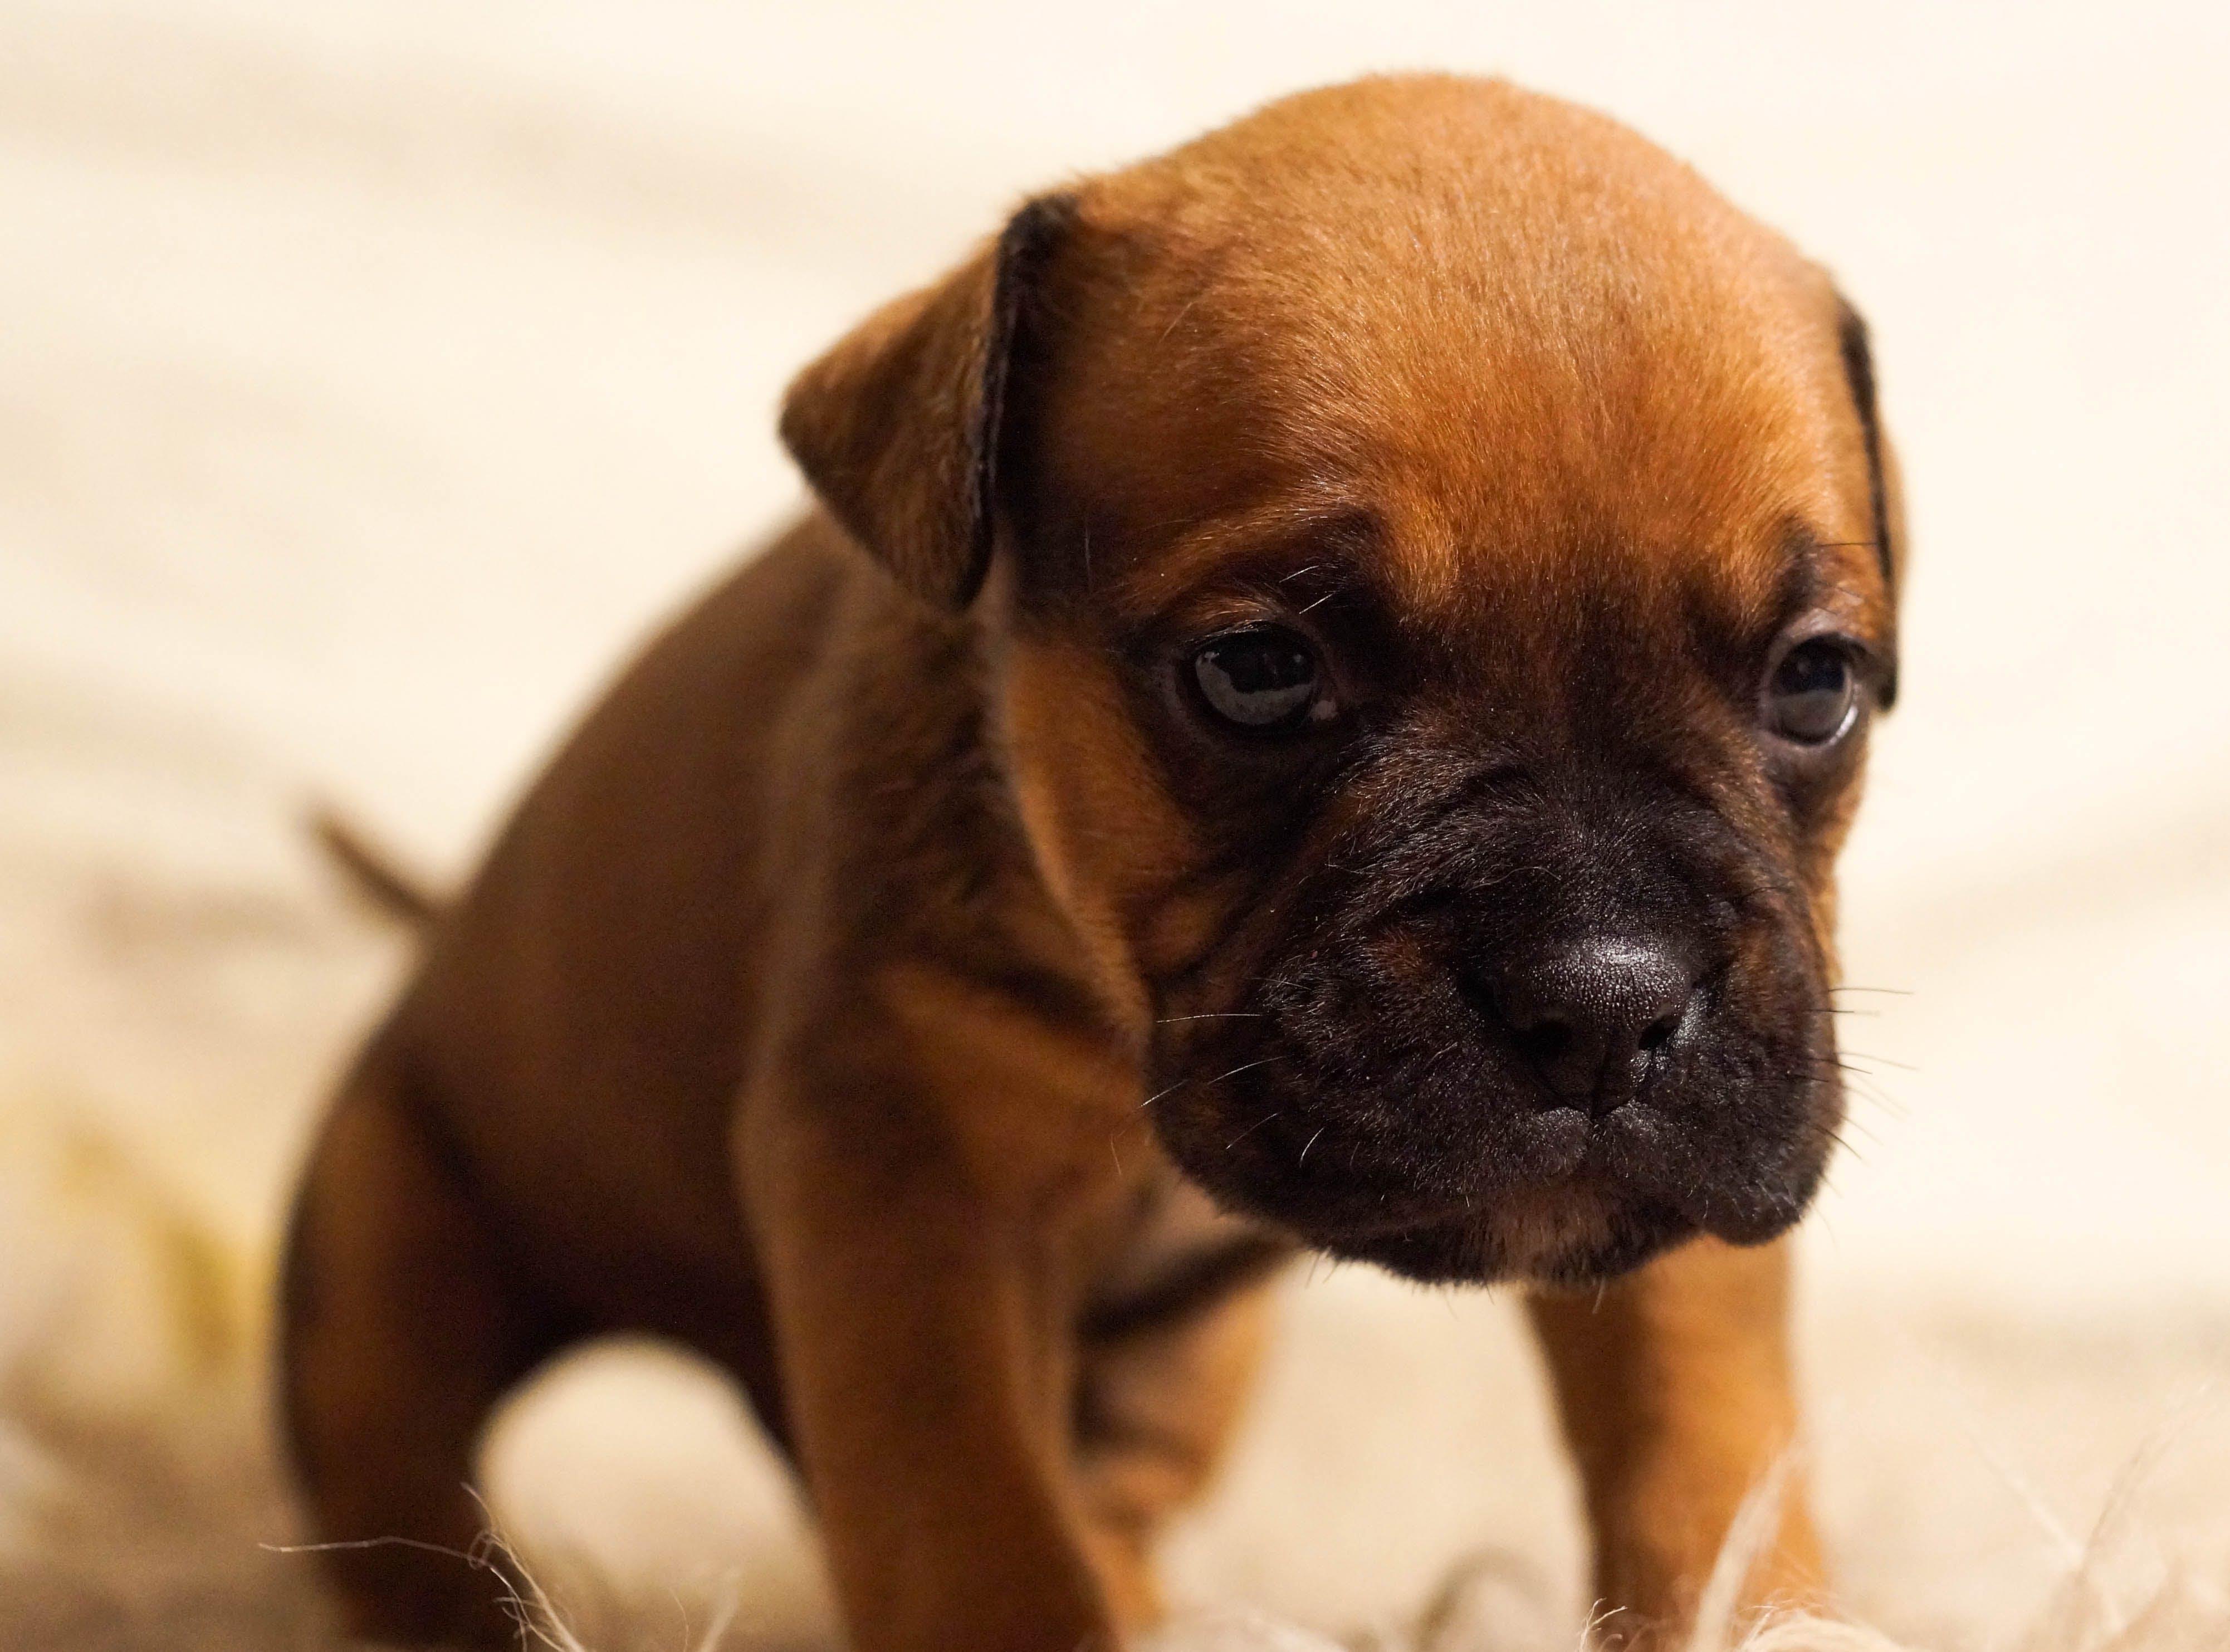 Free stock photo of animal, dog, pet, bulldog